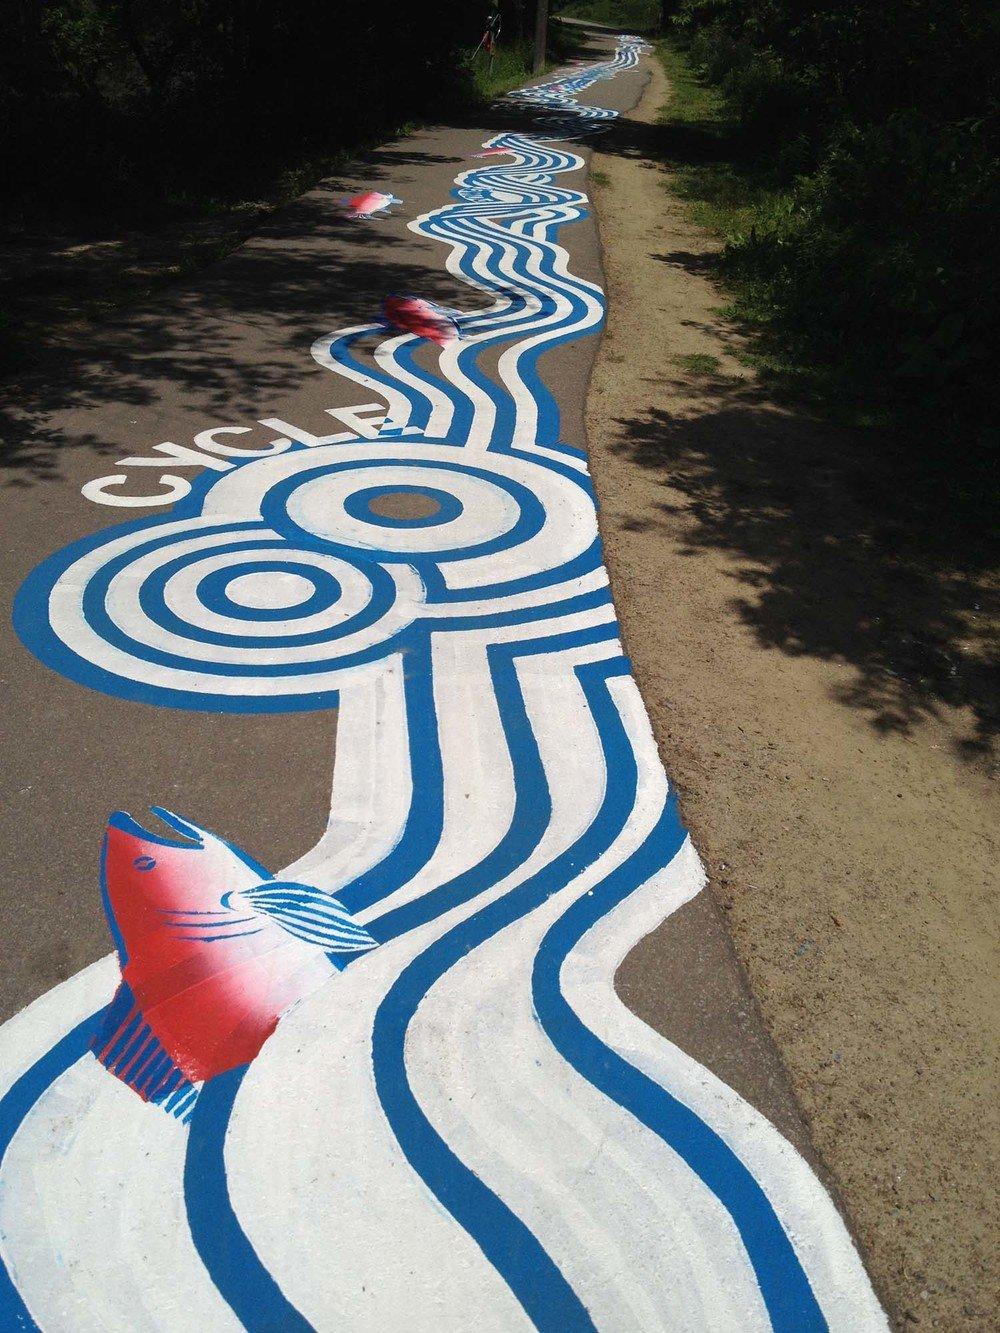 street-art-piste-ciclabili-montreal-roadsworth-15